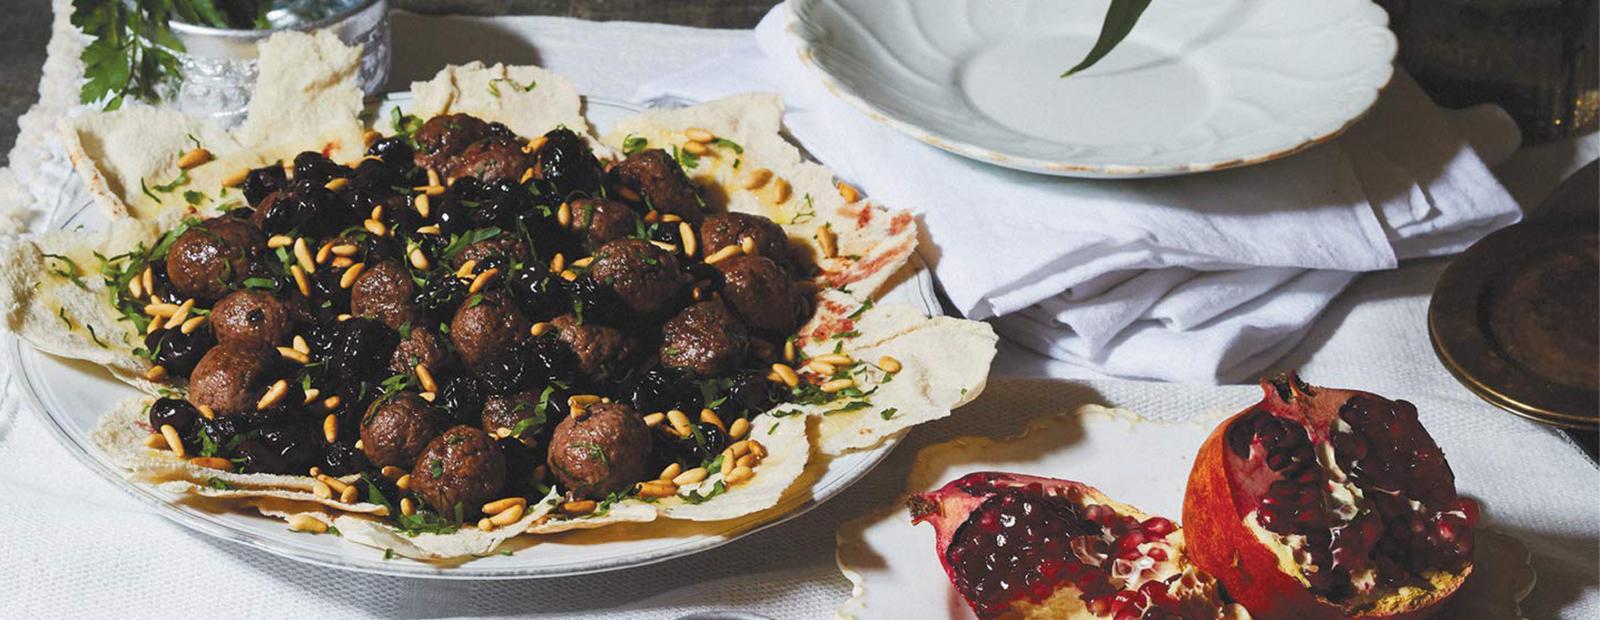 Image of Islamic food